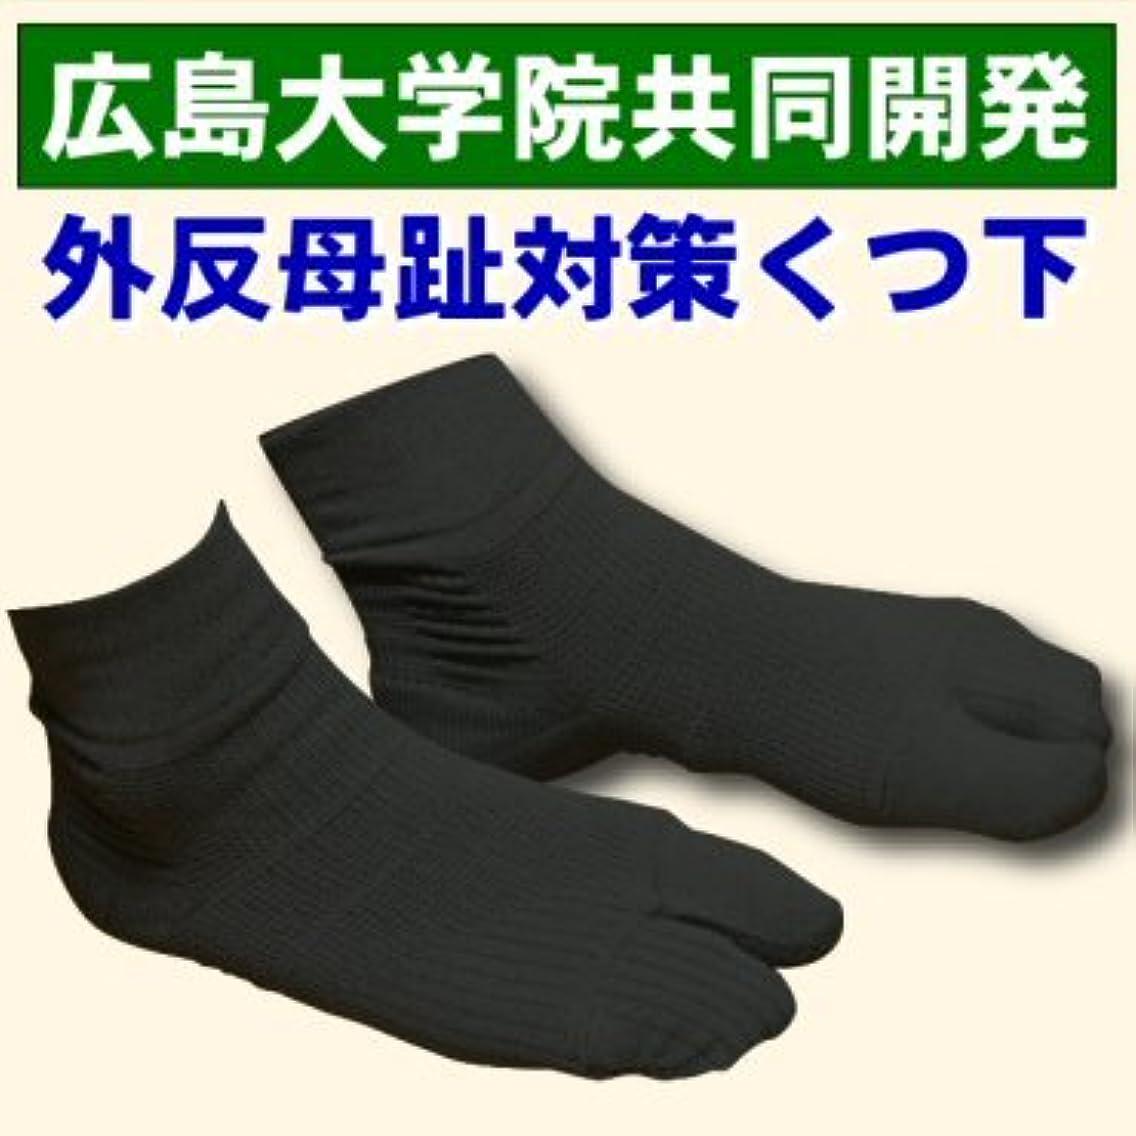 田舎者発送前文外反母趾対策靴下(24-25cm?ブラック)【日本製】